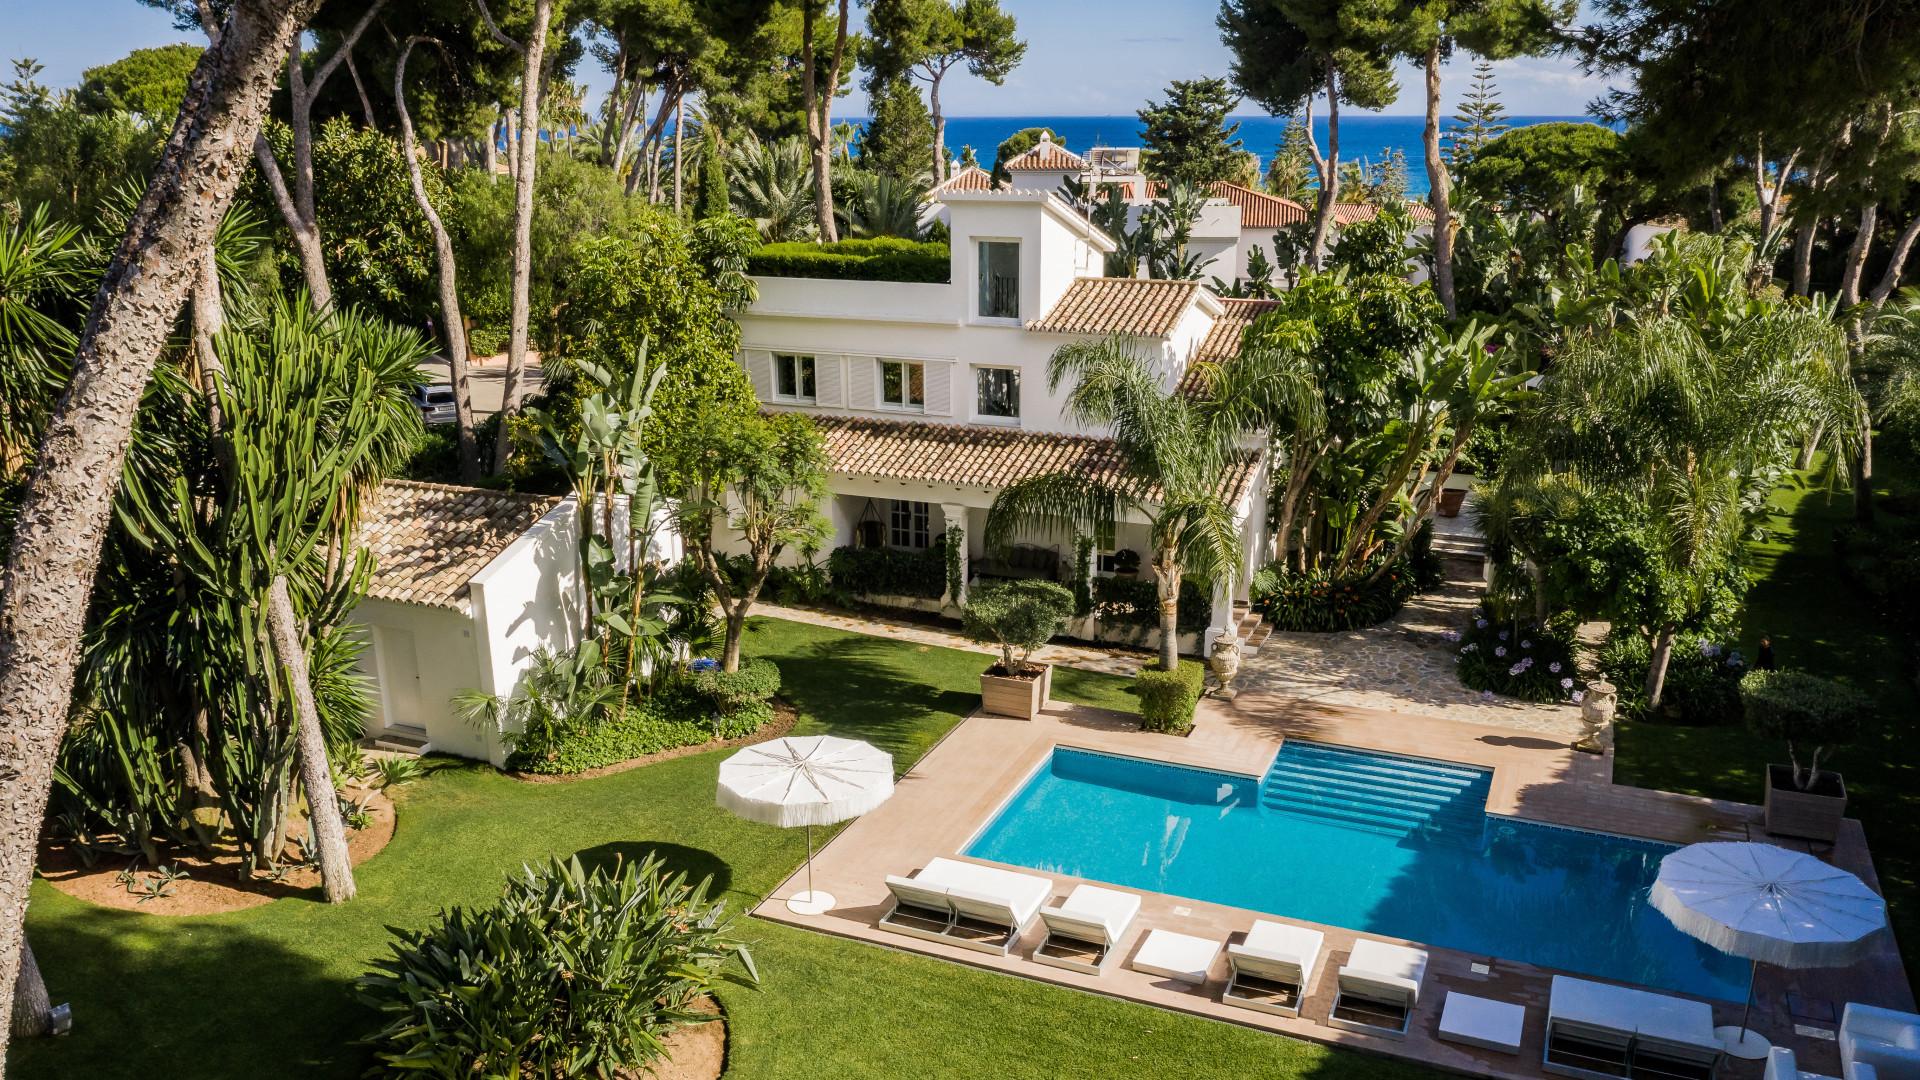 Villa zum Verkauf en Los Monteros, Marbella Ost